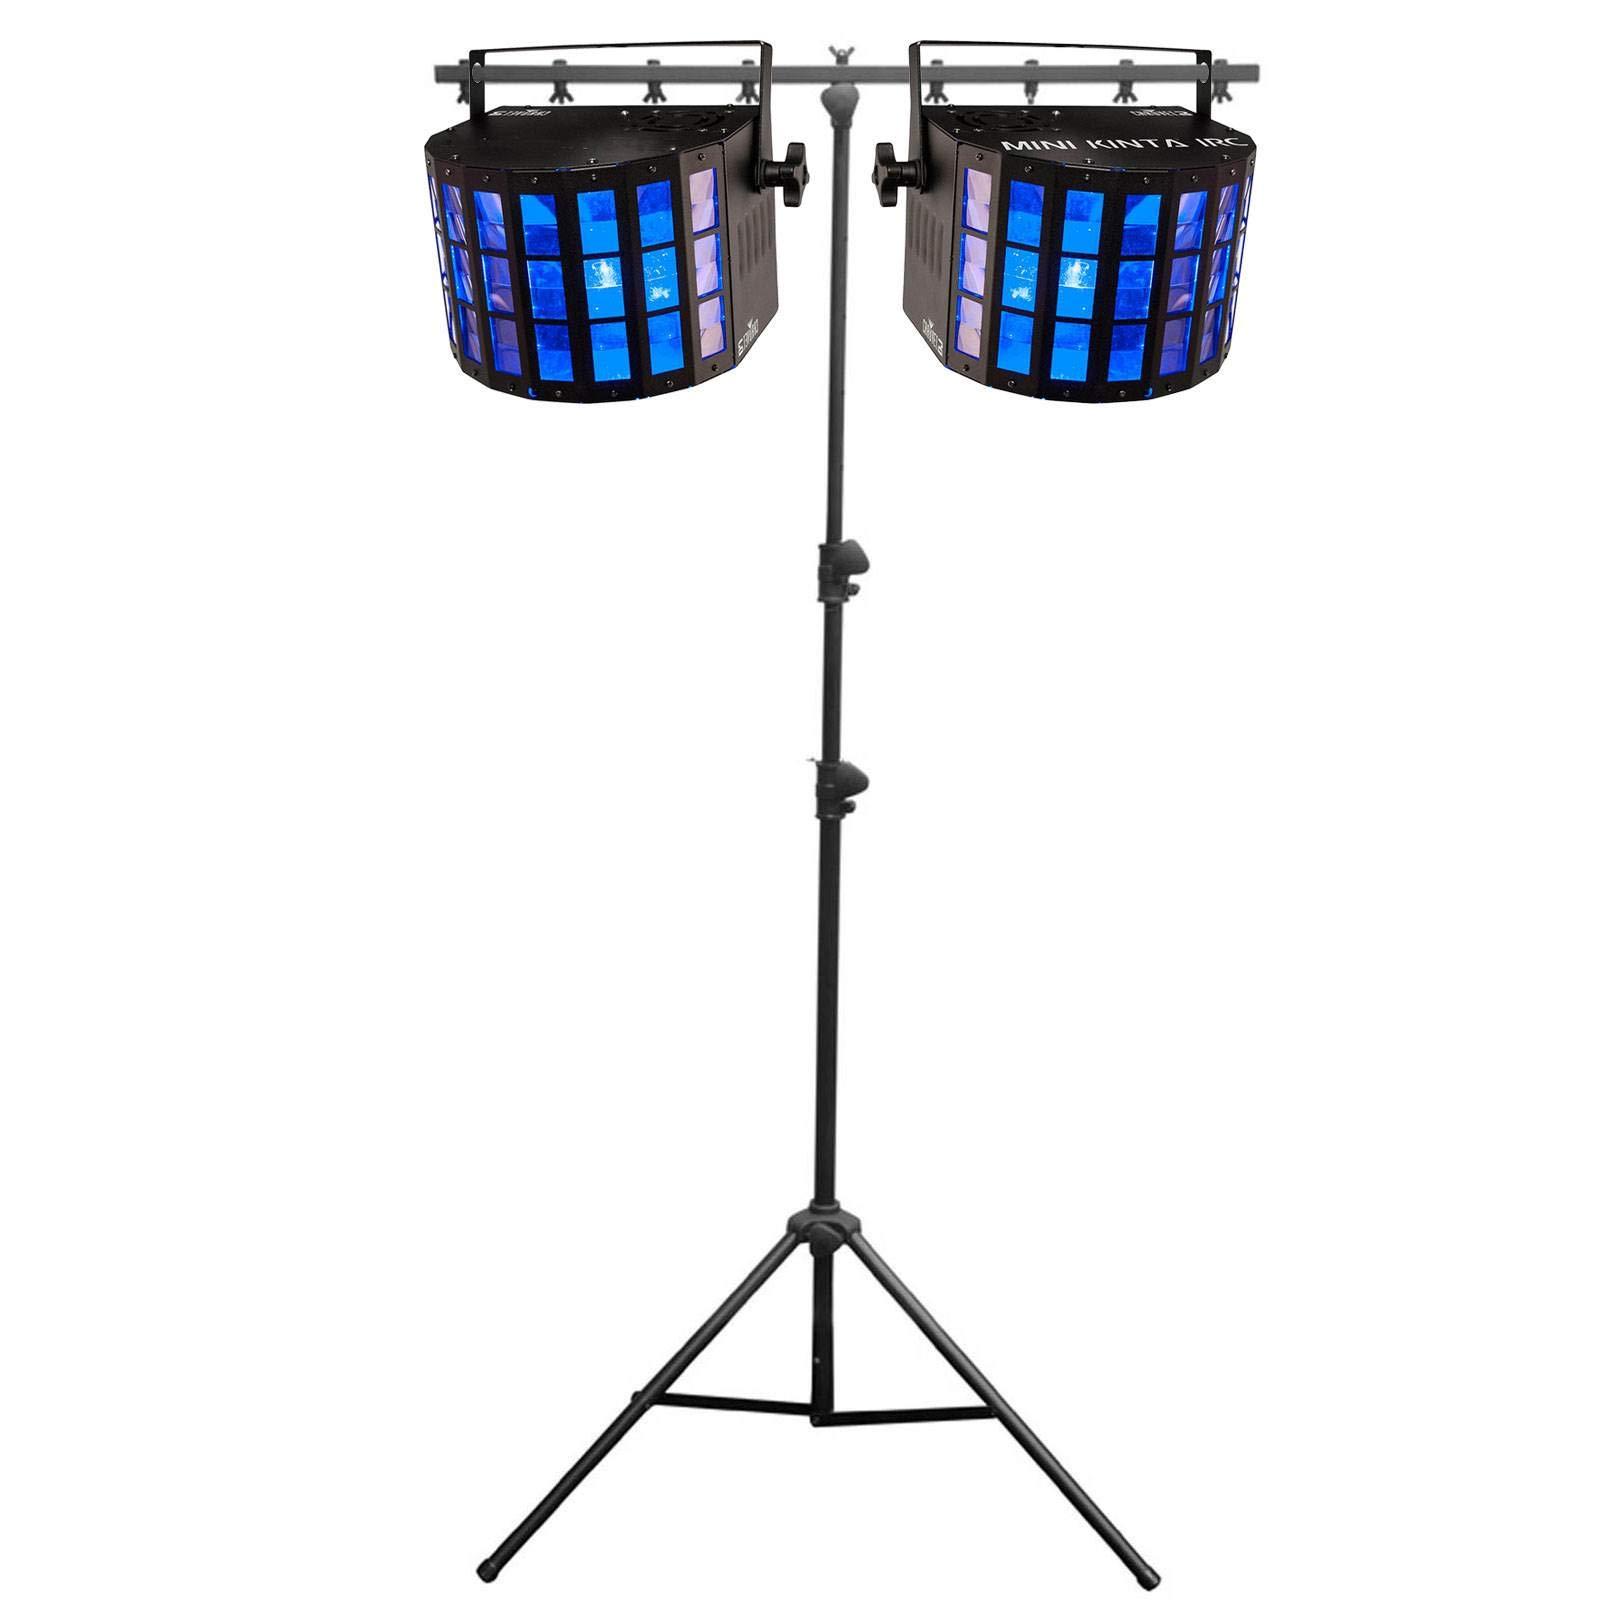 Chauvet DJ Mini Kinta IRC LED RGBW DMX Lights (2 Pack) + Portable Tripod Stand by CHAUVET DJ